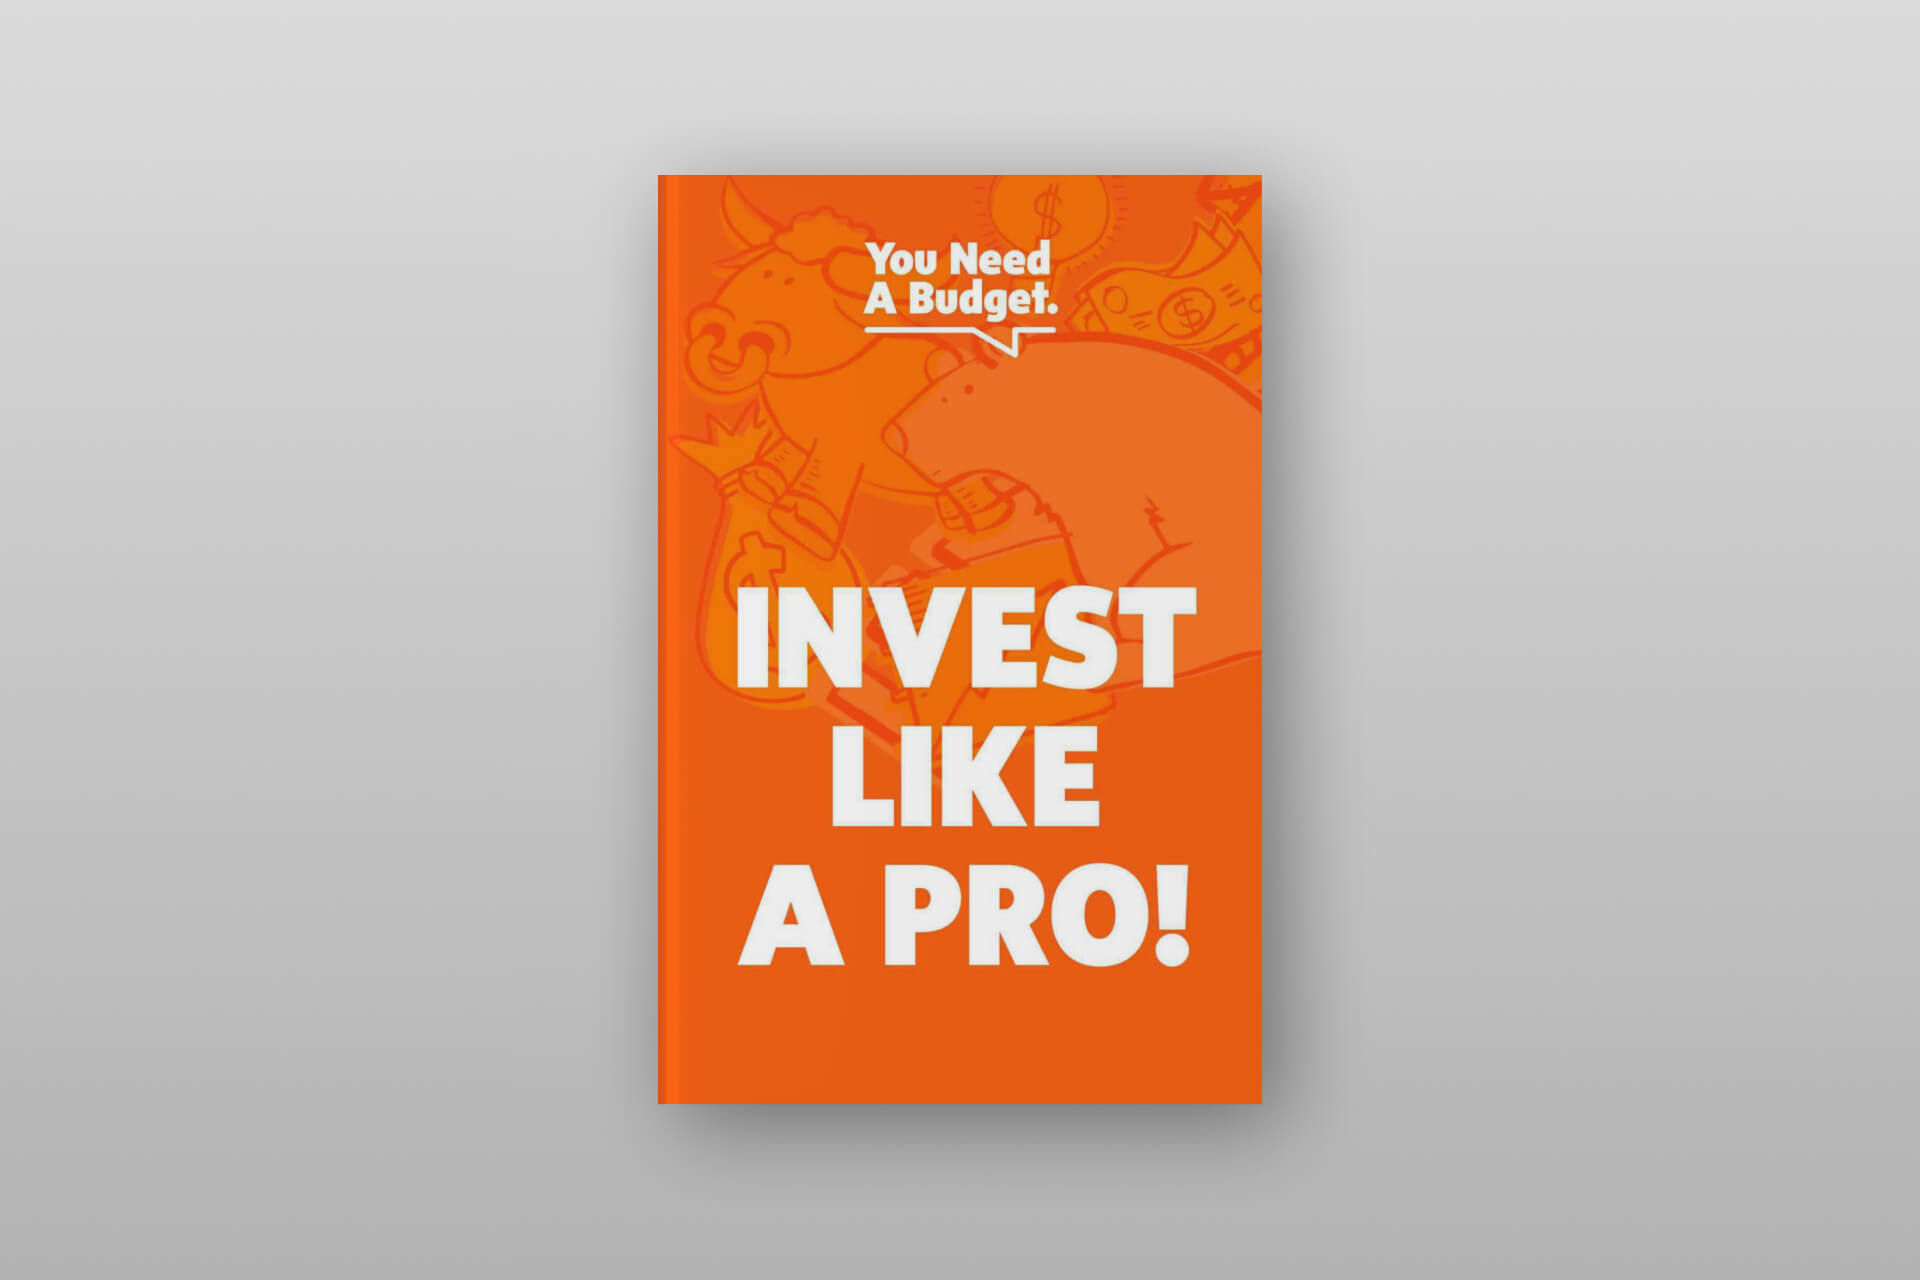 Invest Like a Pro by Jesse Mecham